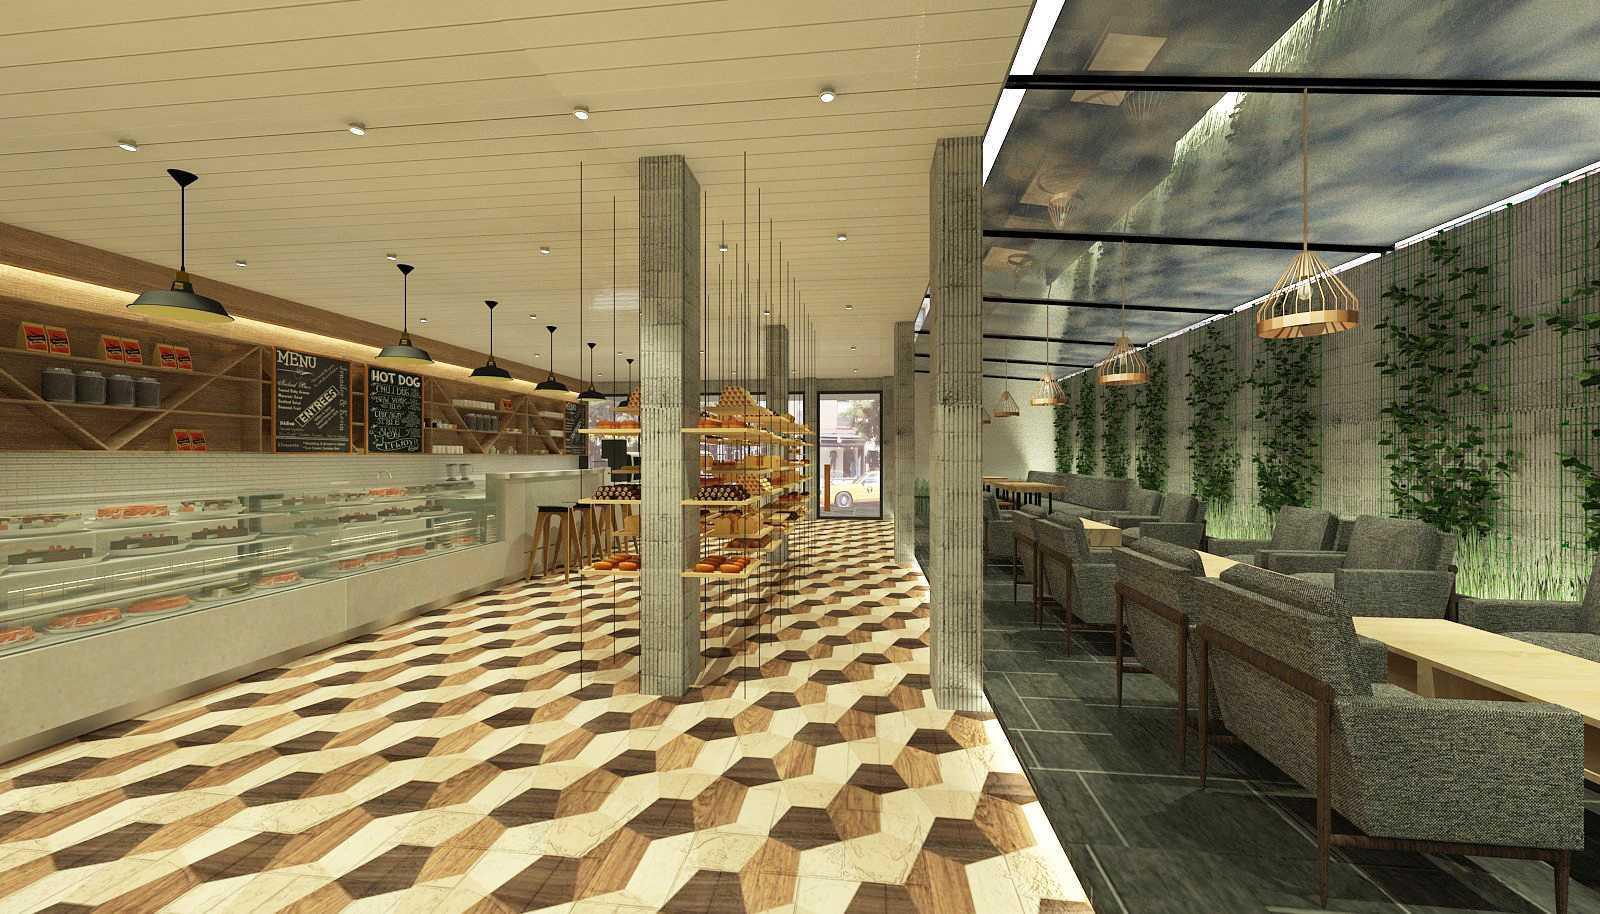 Ra Interior Architecture Papamama Bistro Greenville Greenville Dining Area   10011